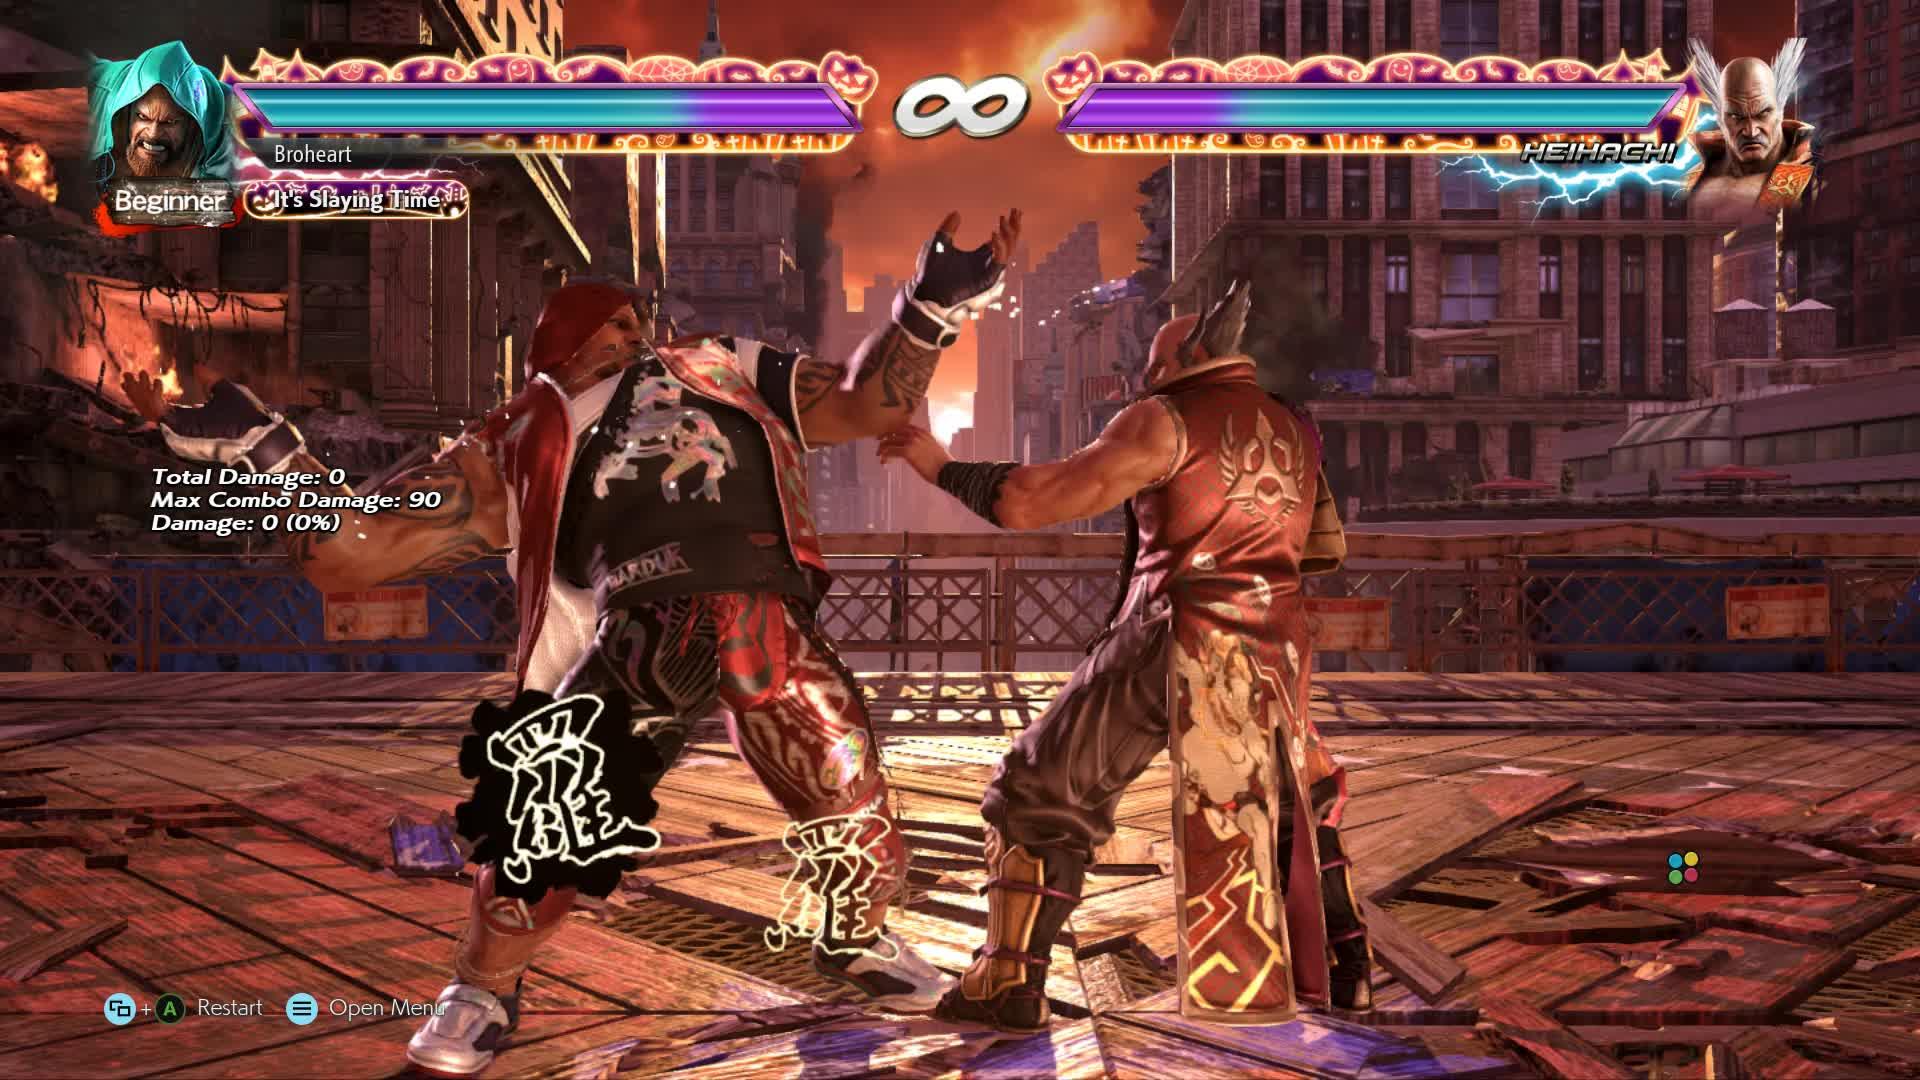 tekken, Tekken 7 2019.04.17 - 17.33.02.13 GIFs